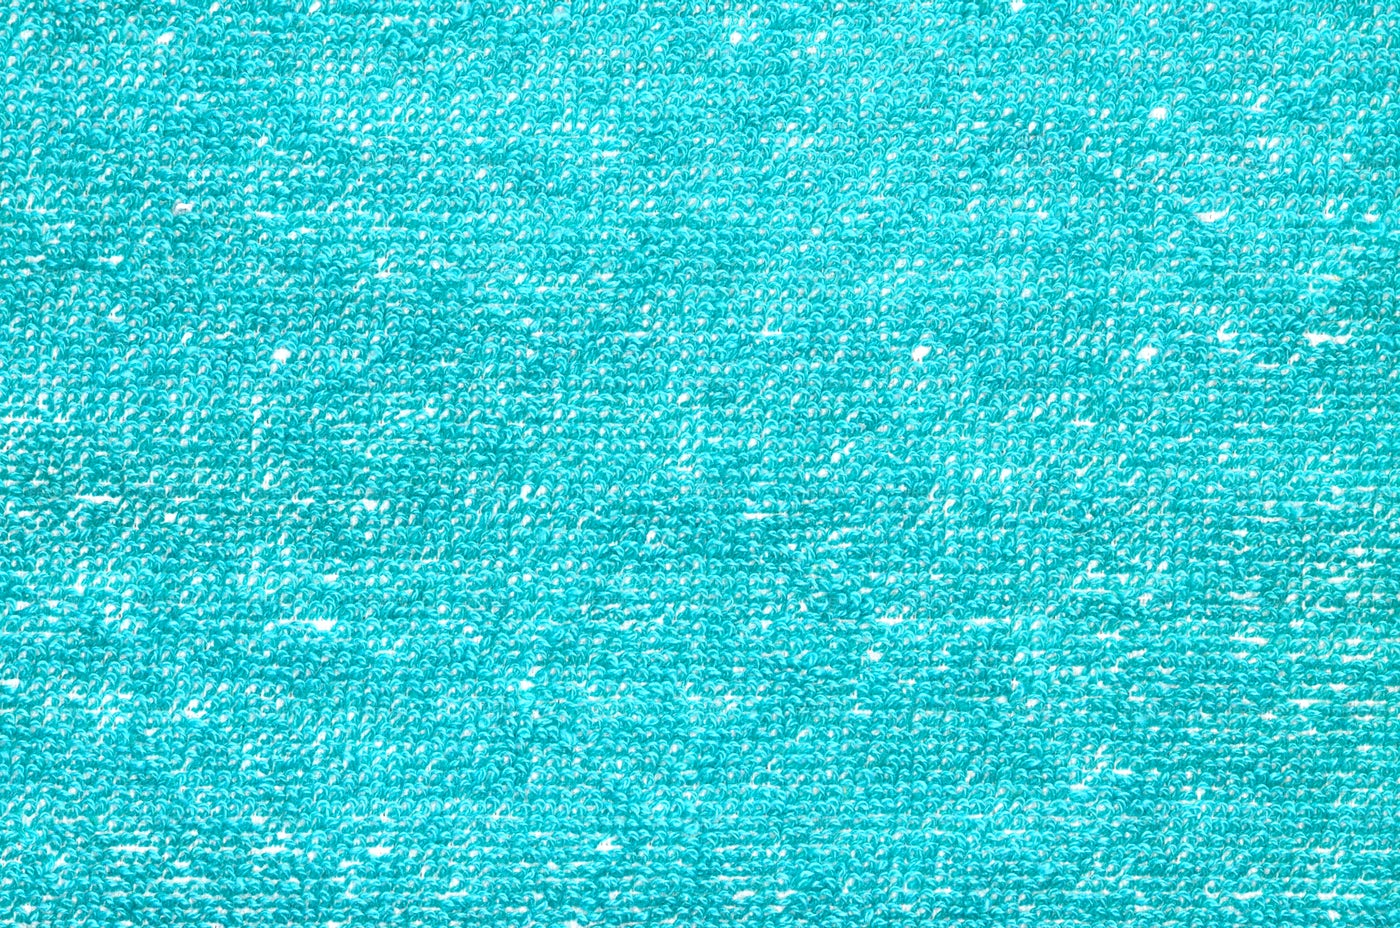 Turquoise Fabric: Stock Photos